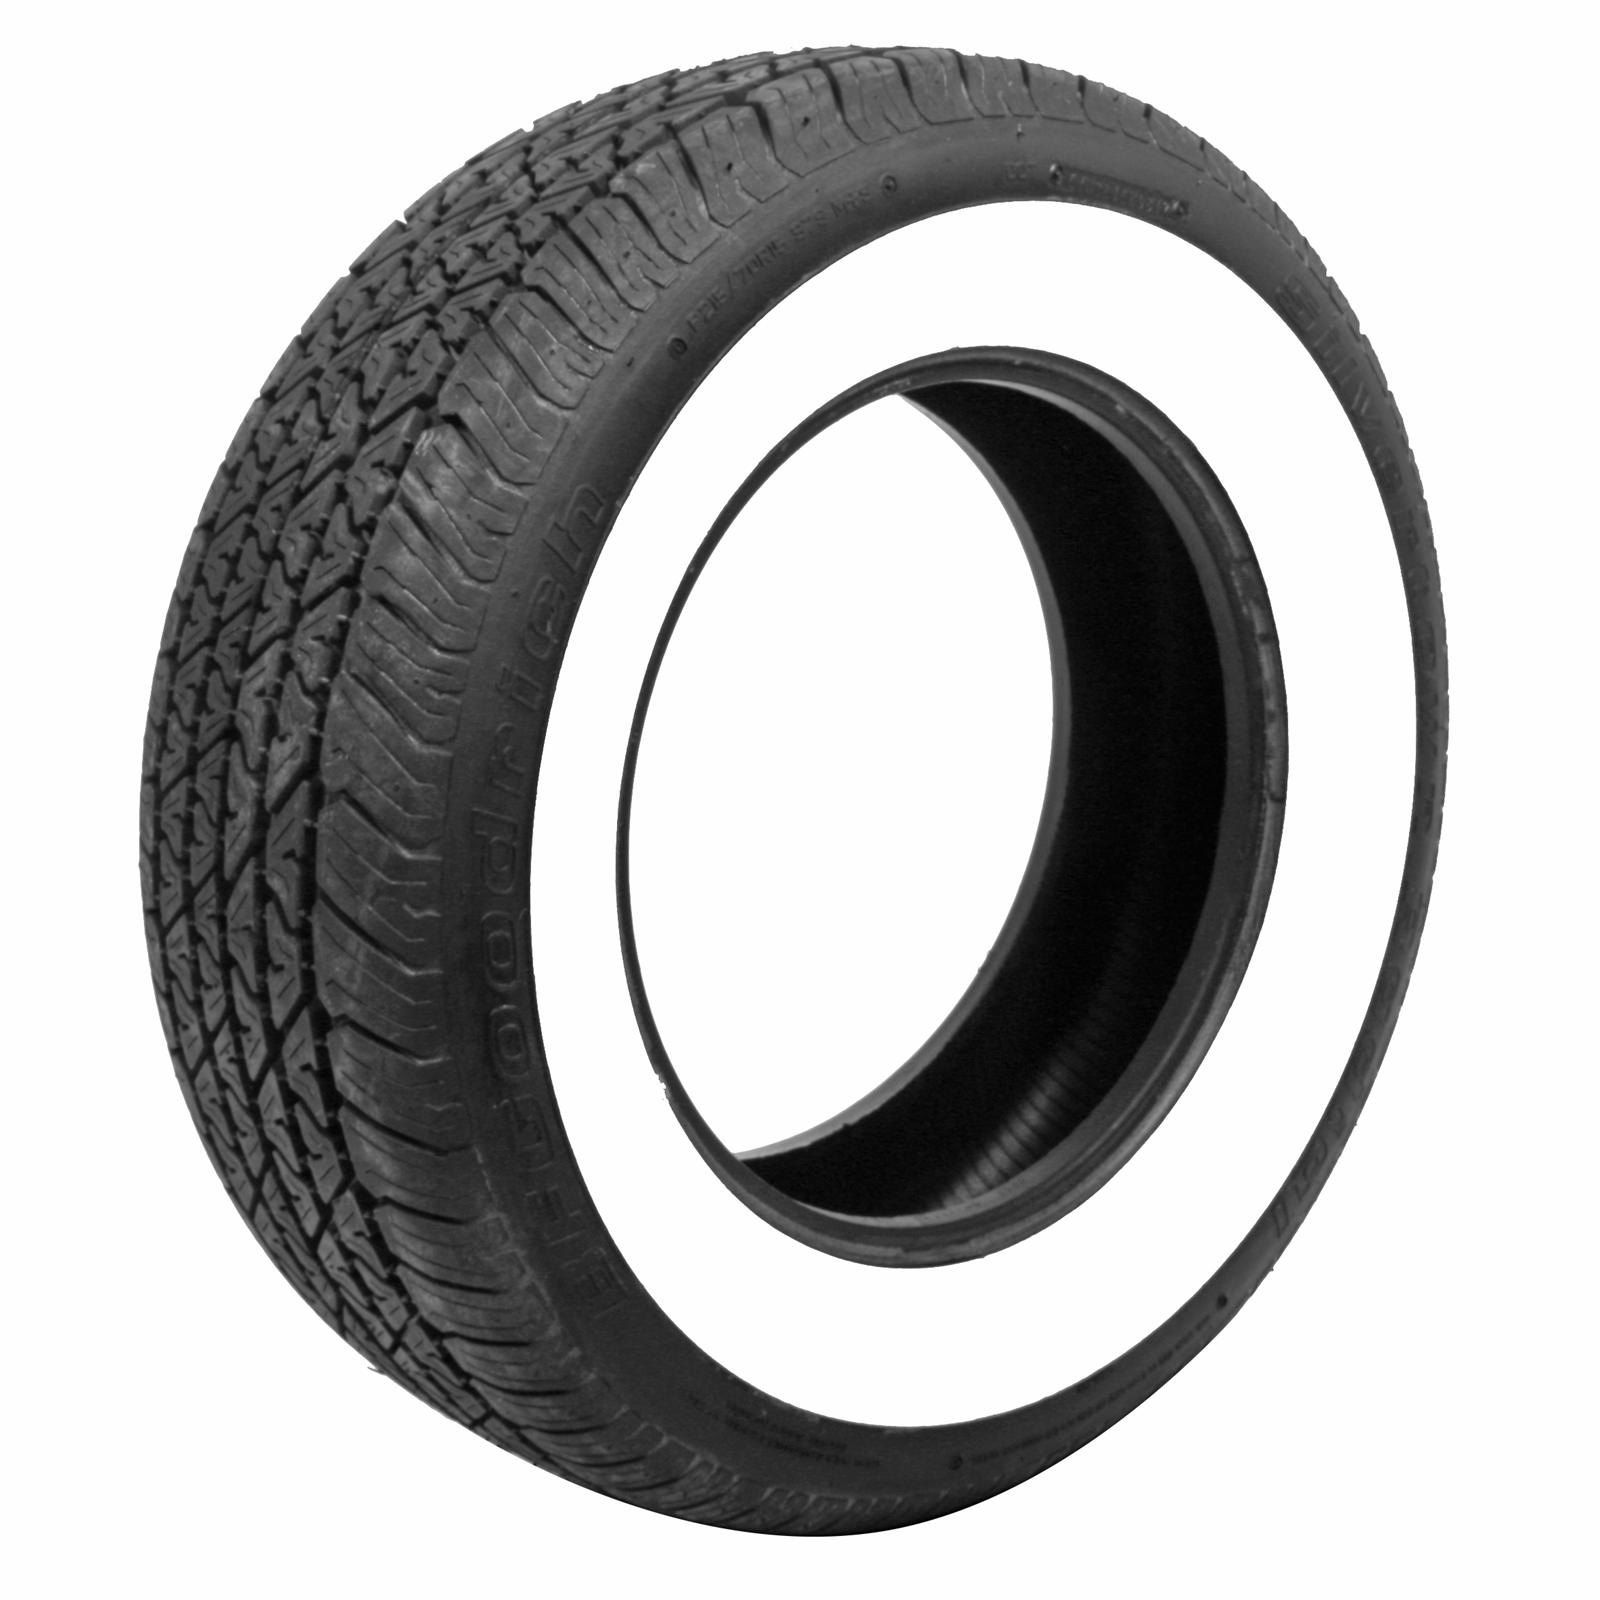 Coker BFGoodrich Silvertown Radial Tires Free Shipping on